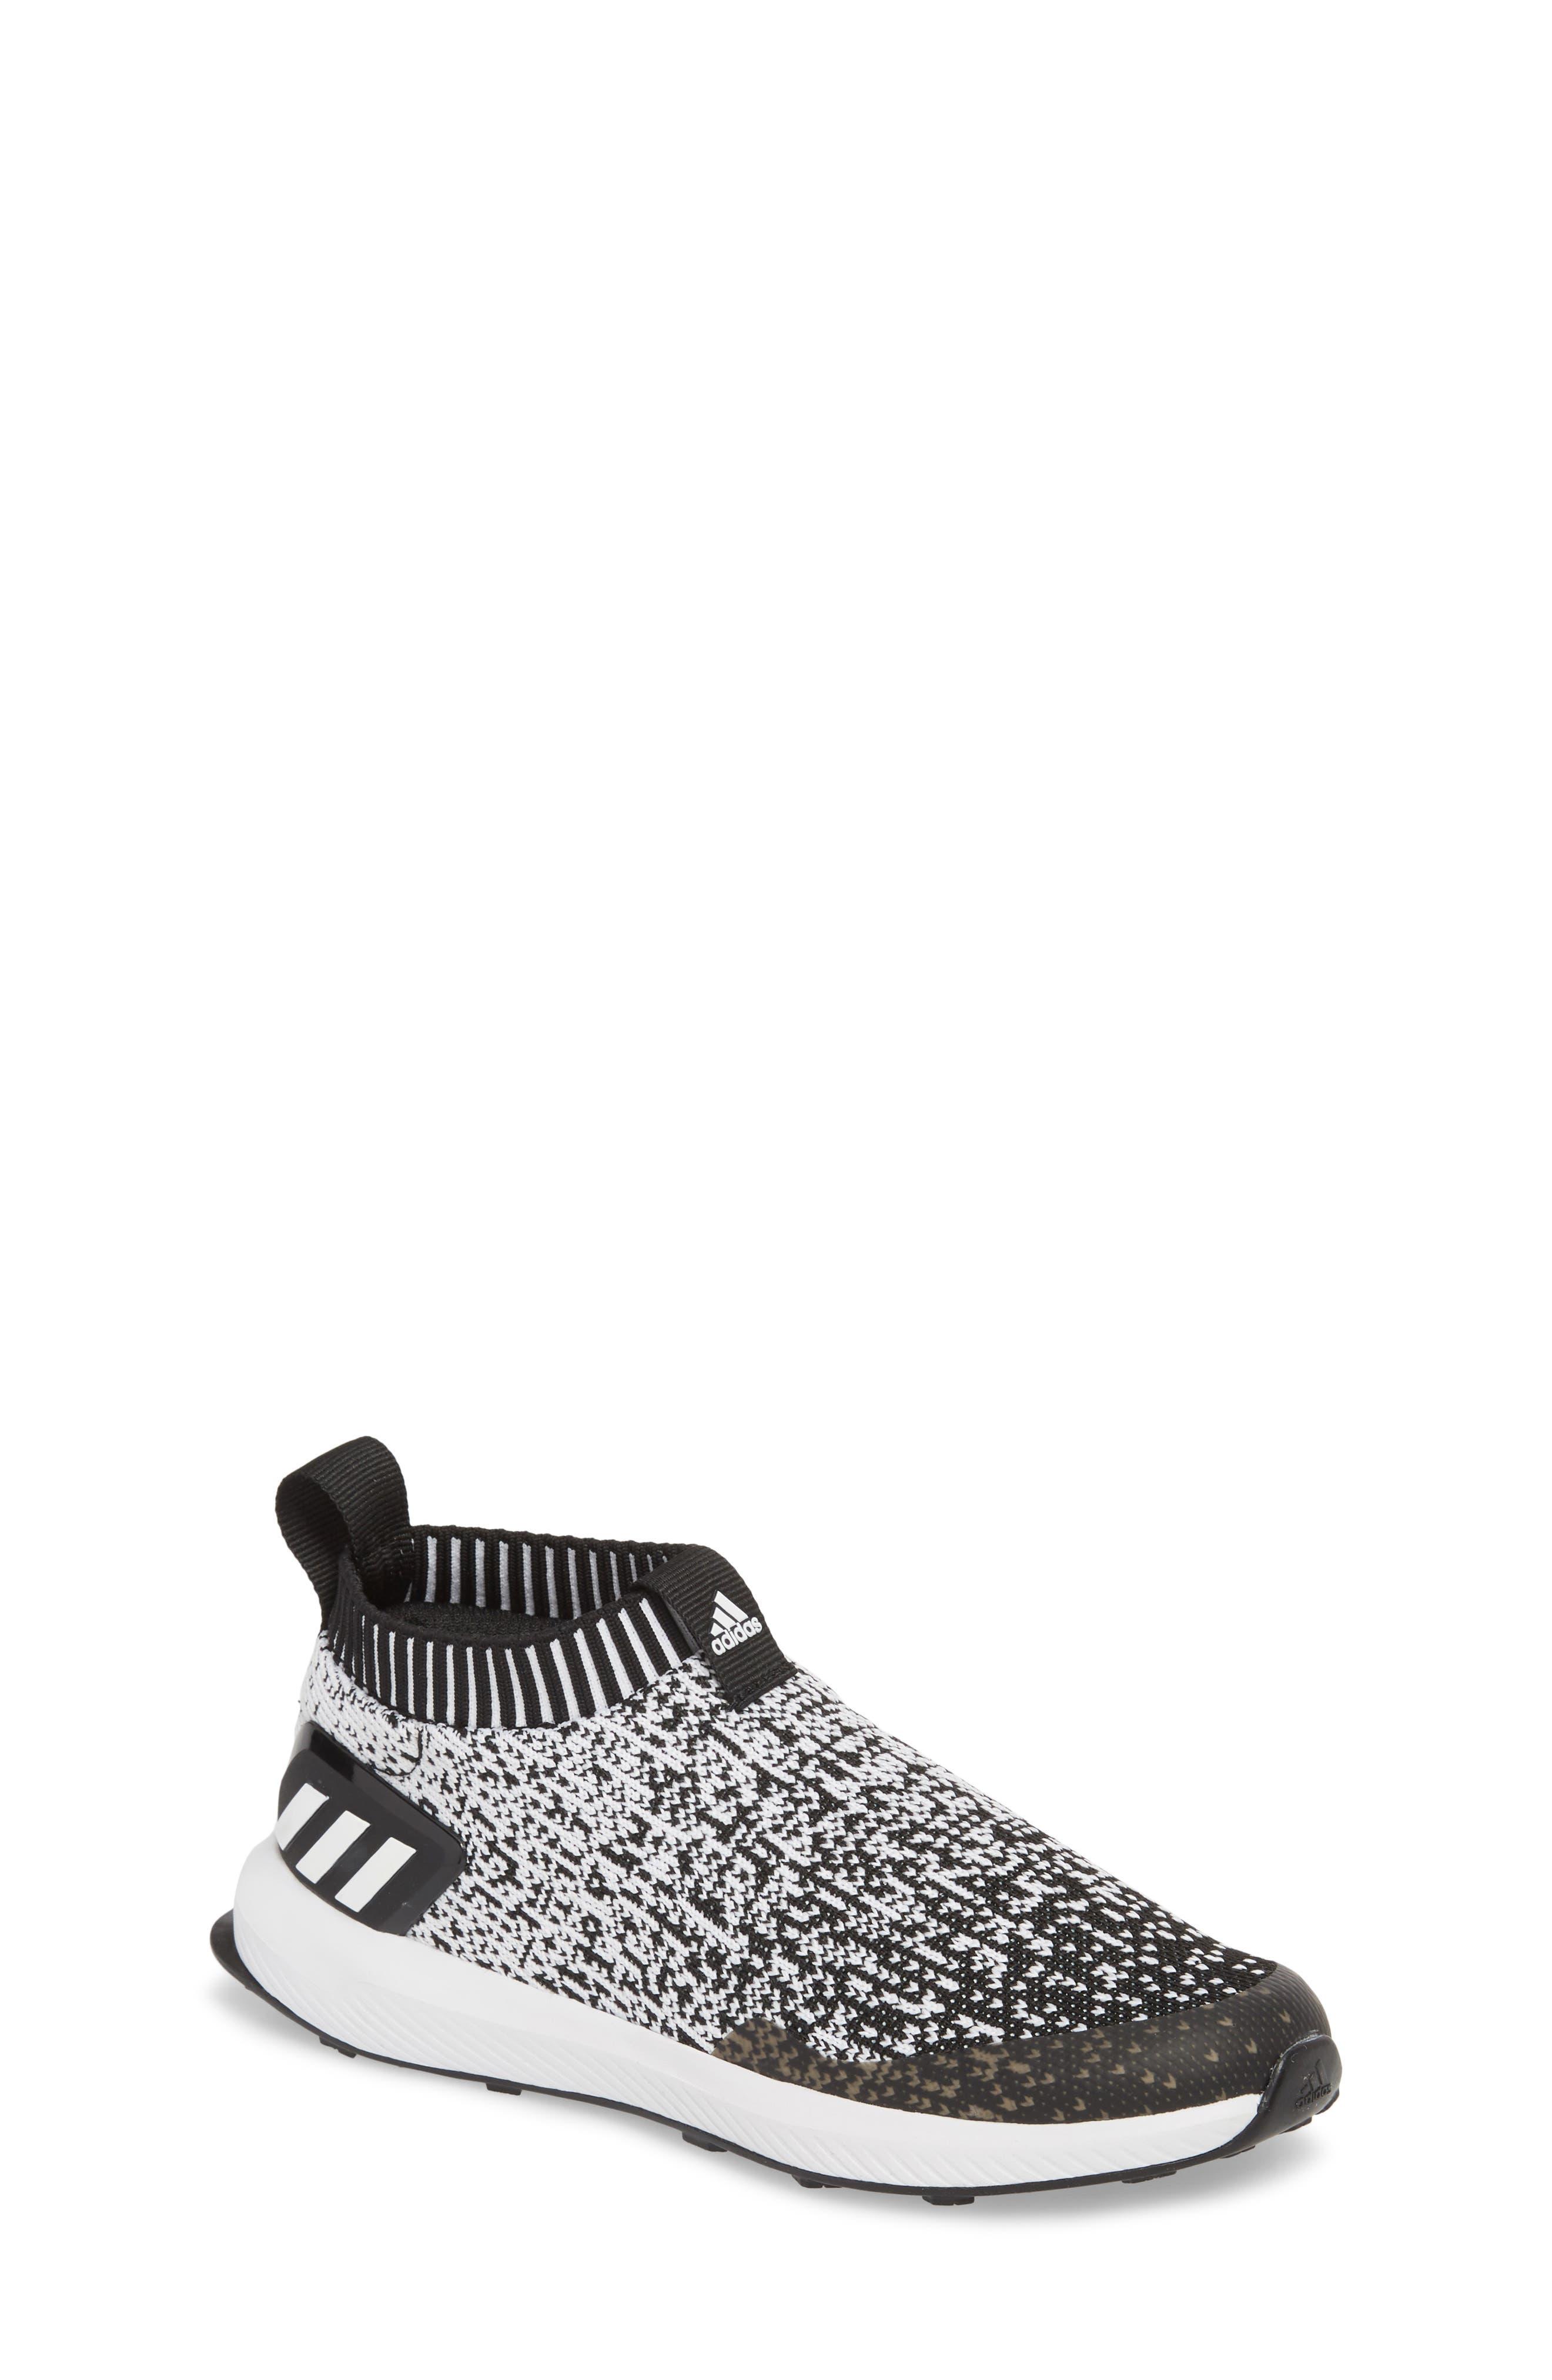 RapidaRun Laceless Knit Sneaker,                         Main,                         color, 001